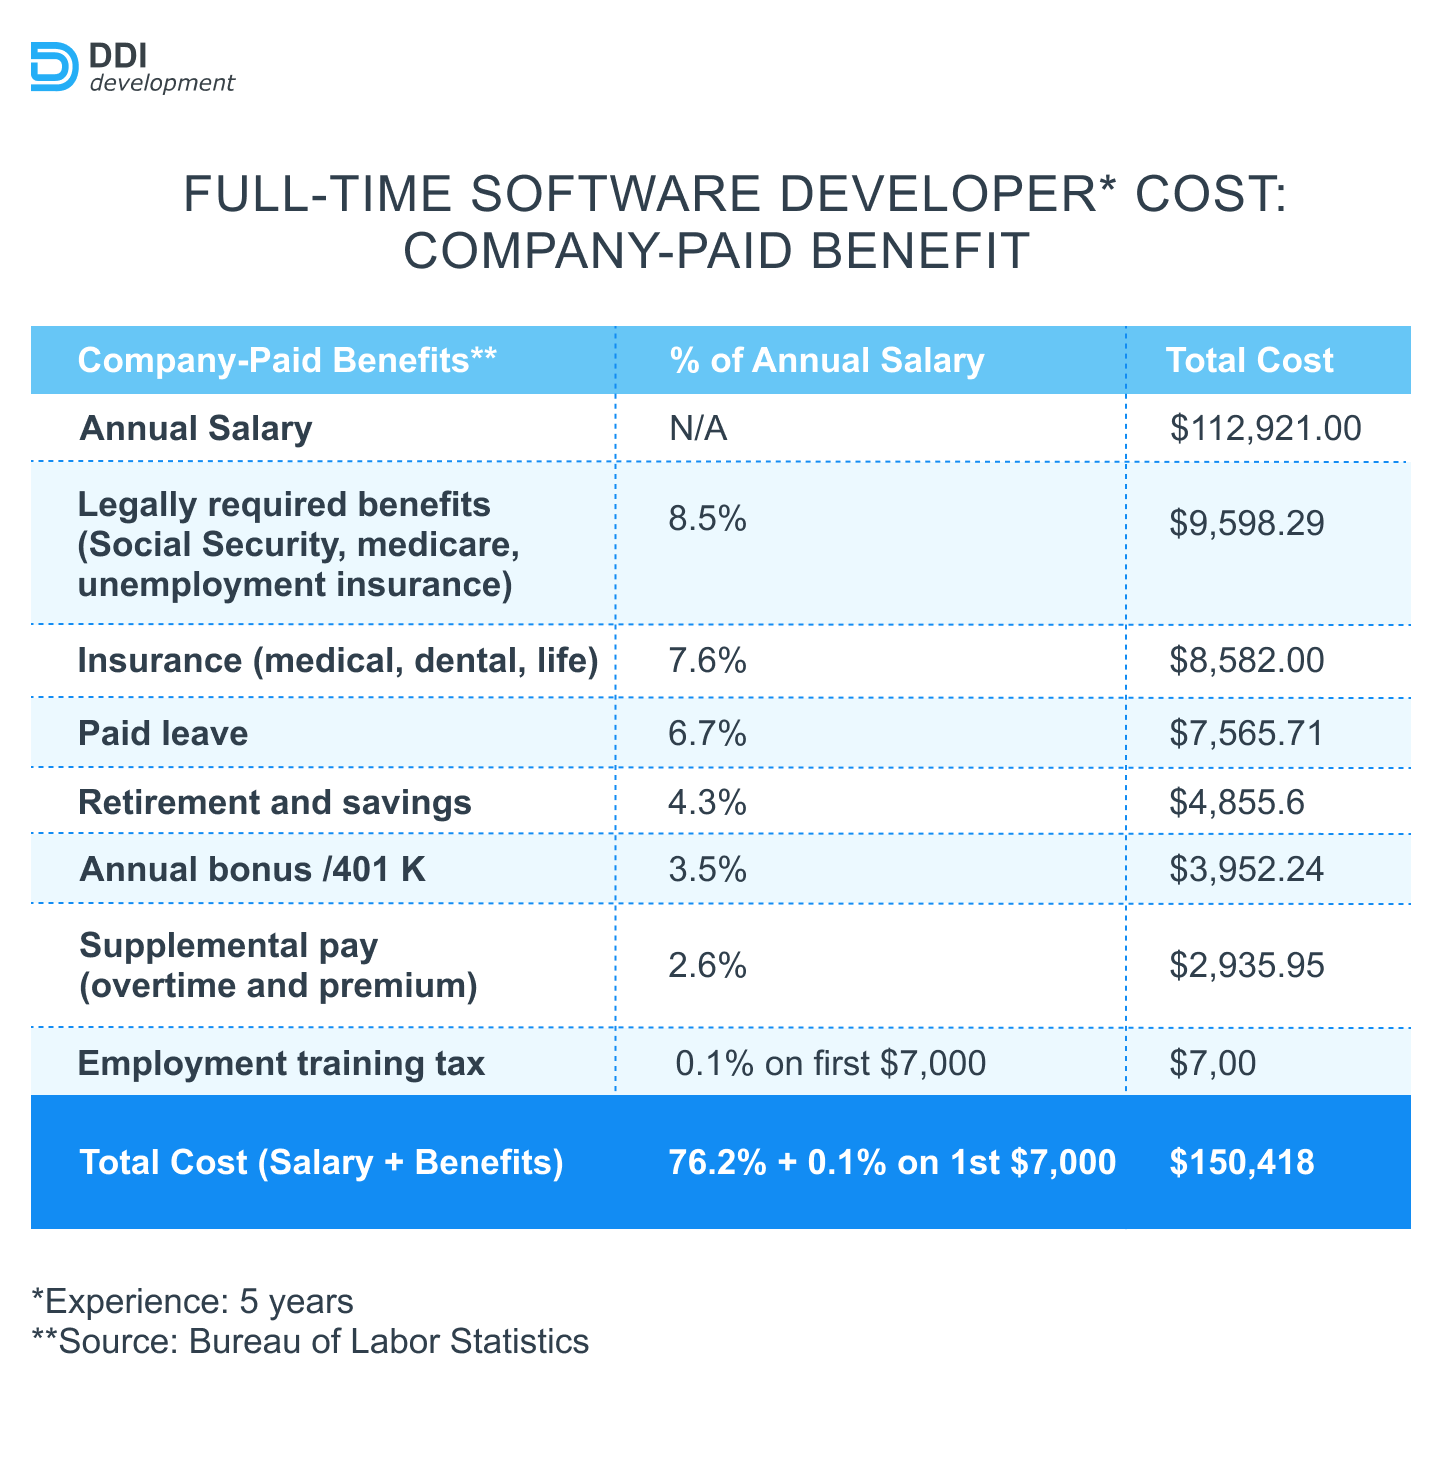 Full-time software developer cost